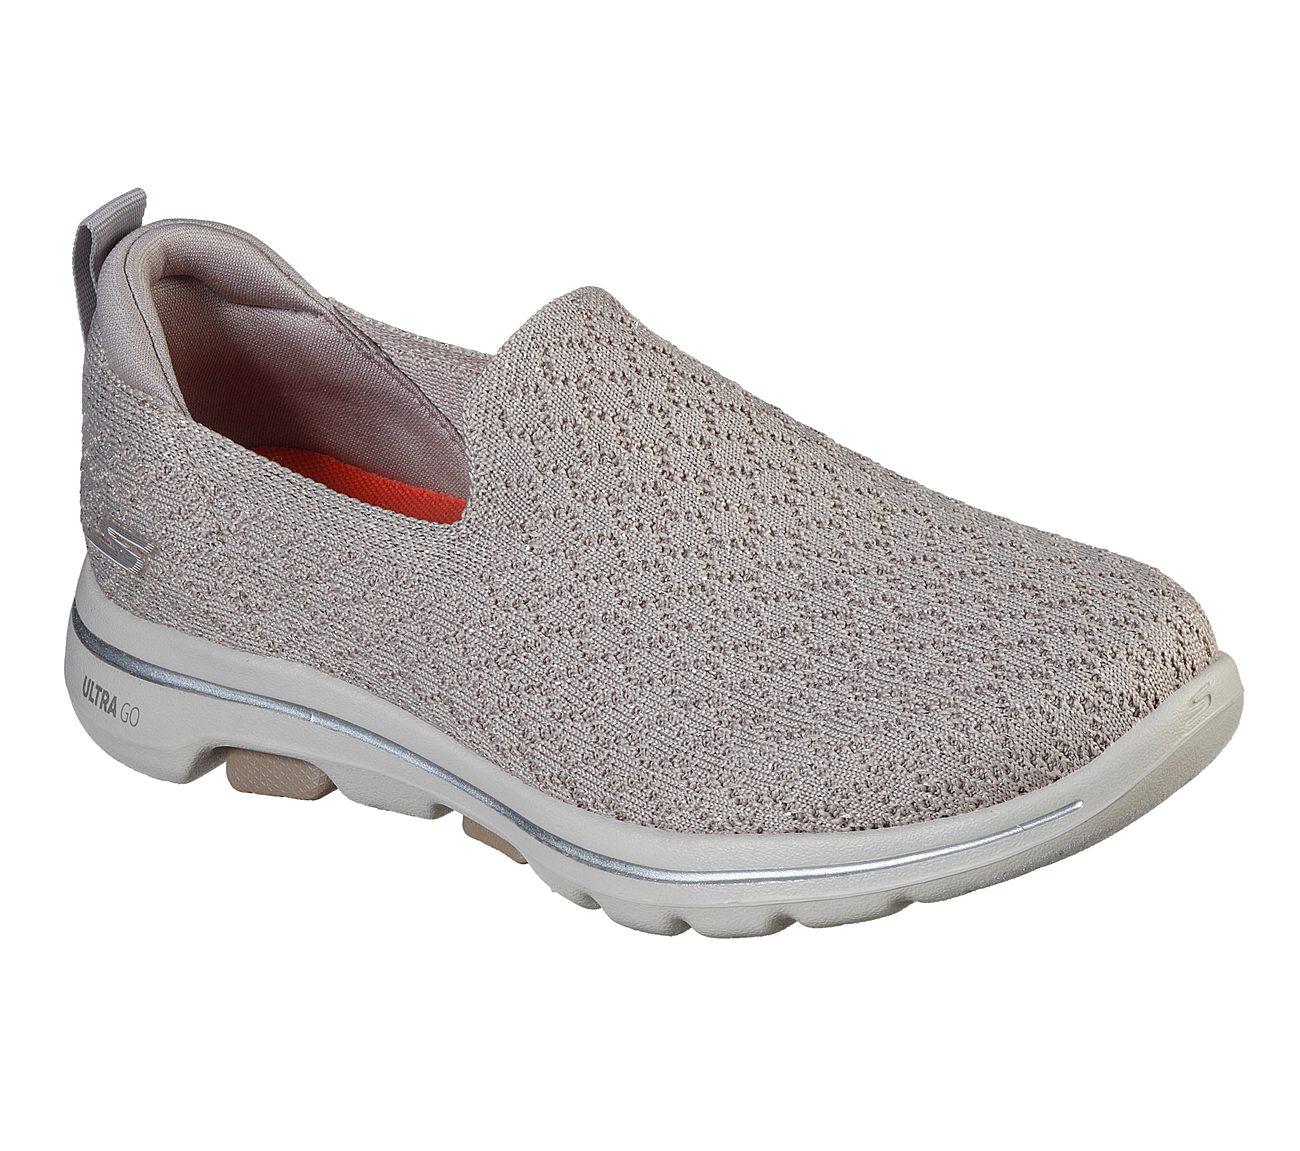 Skechers GOwalk 5 - Brave